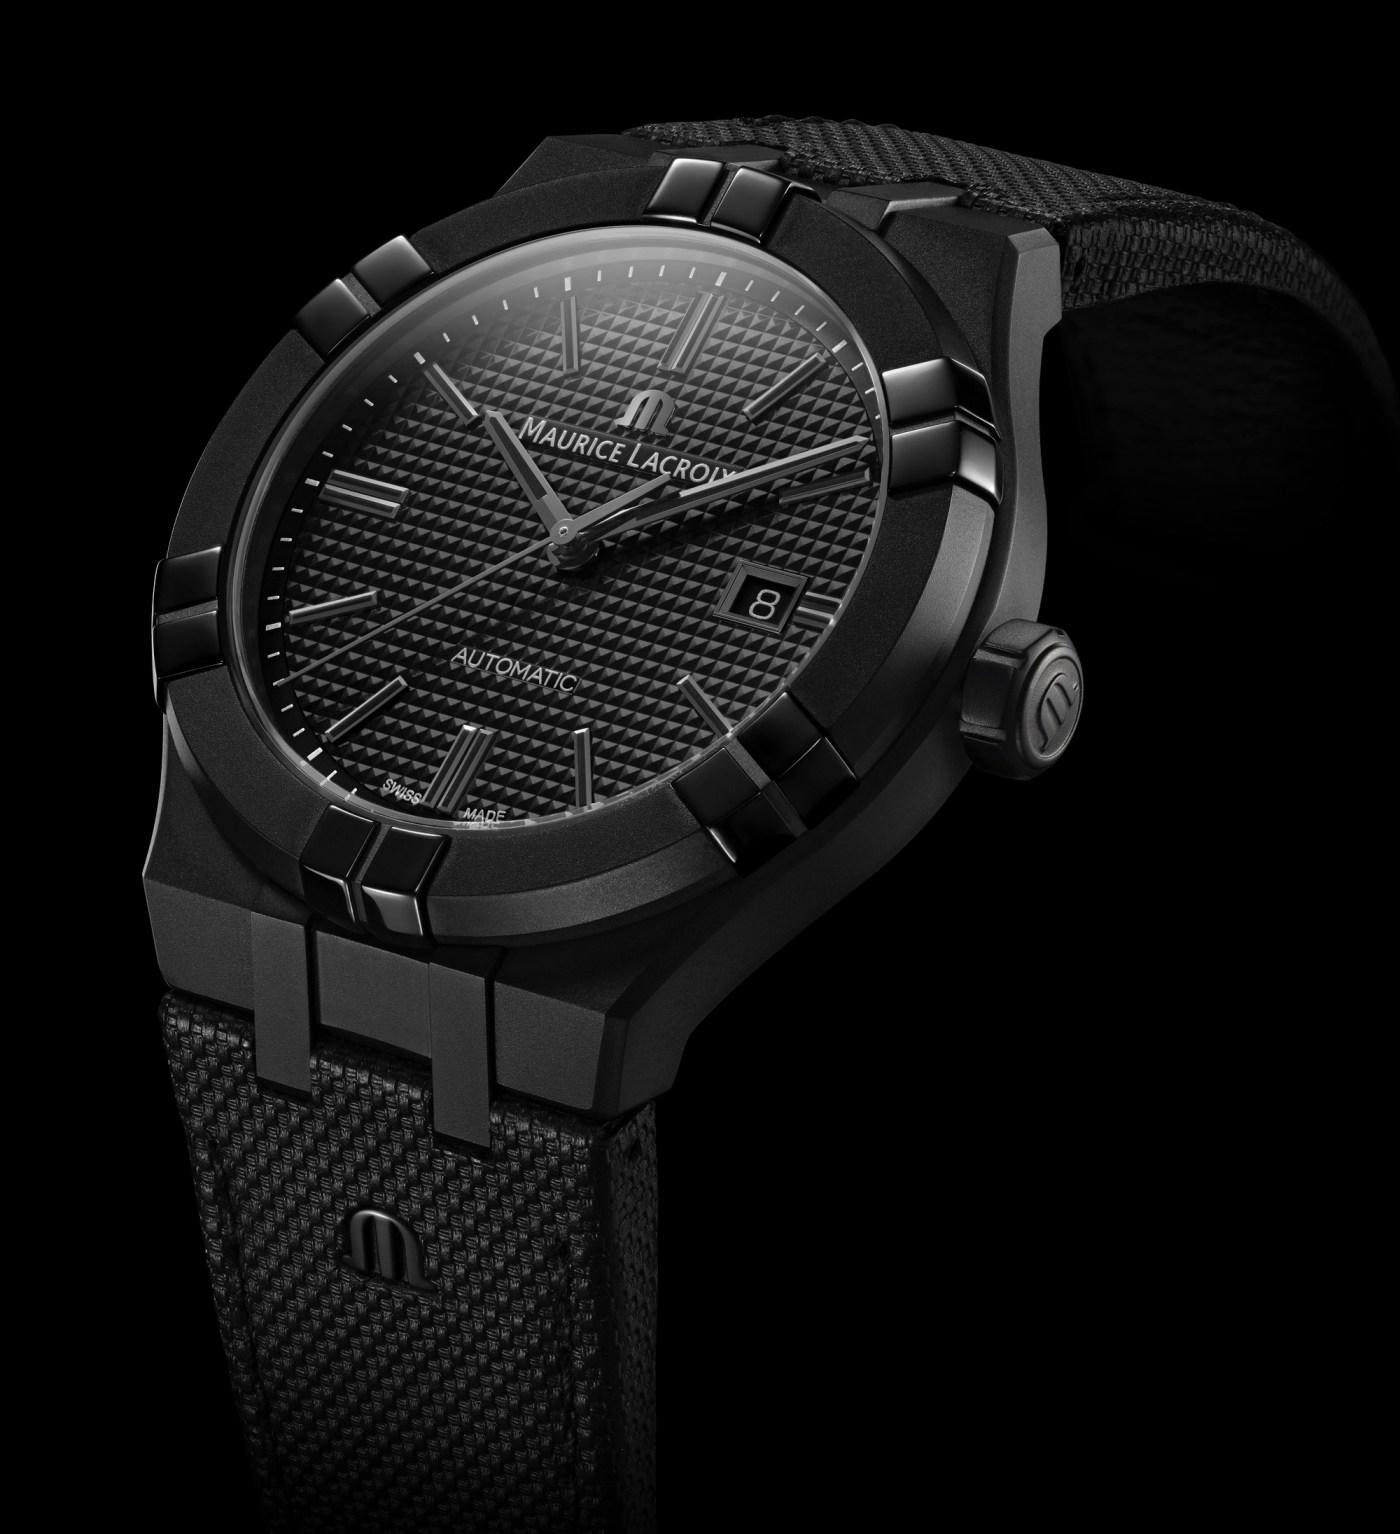 Maurice Lacroix Aikon Automatic Black PVD Steel